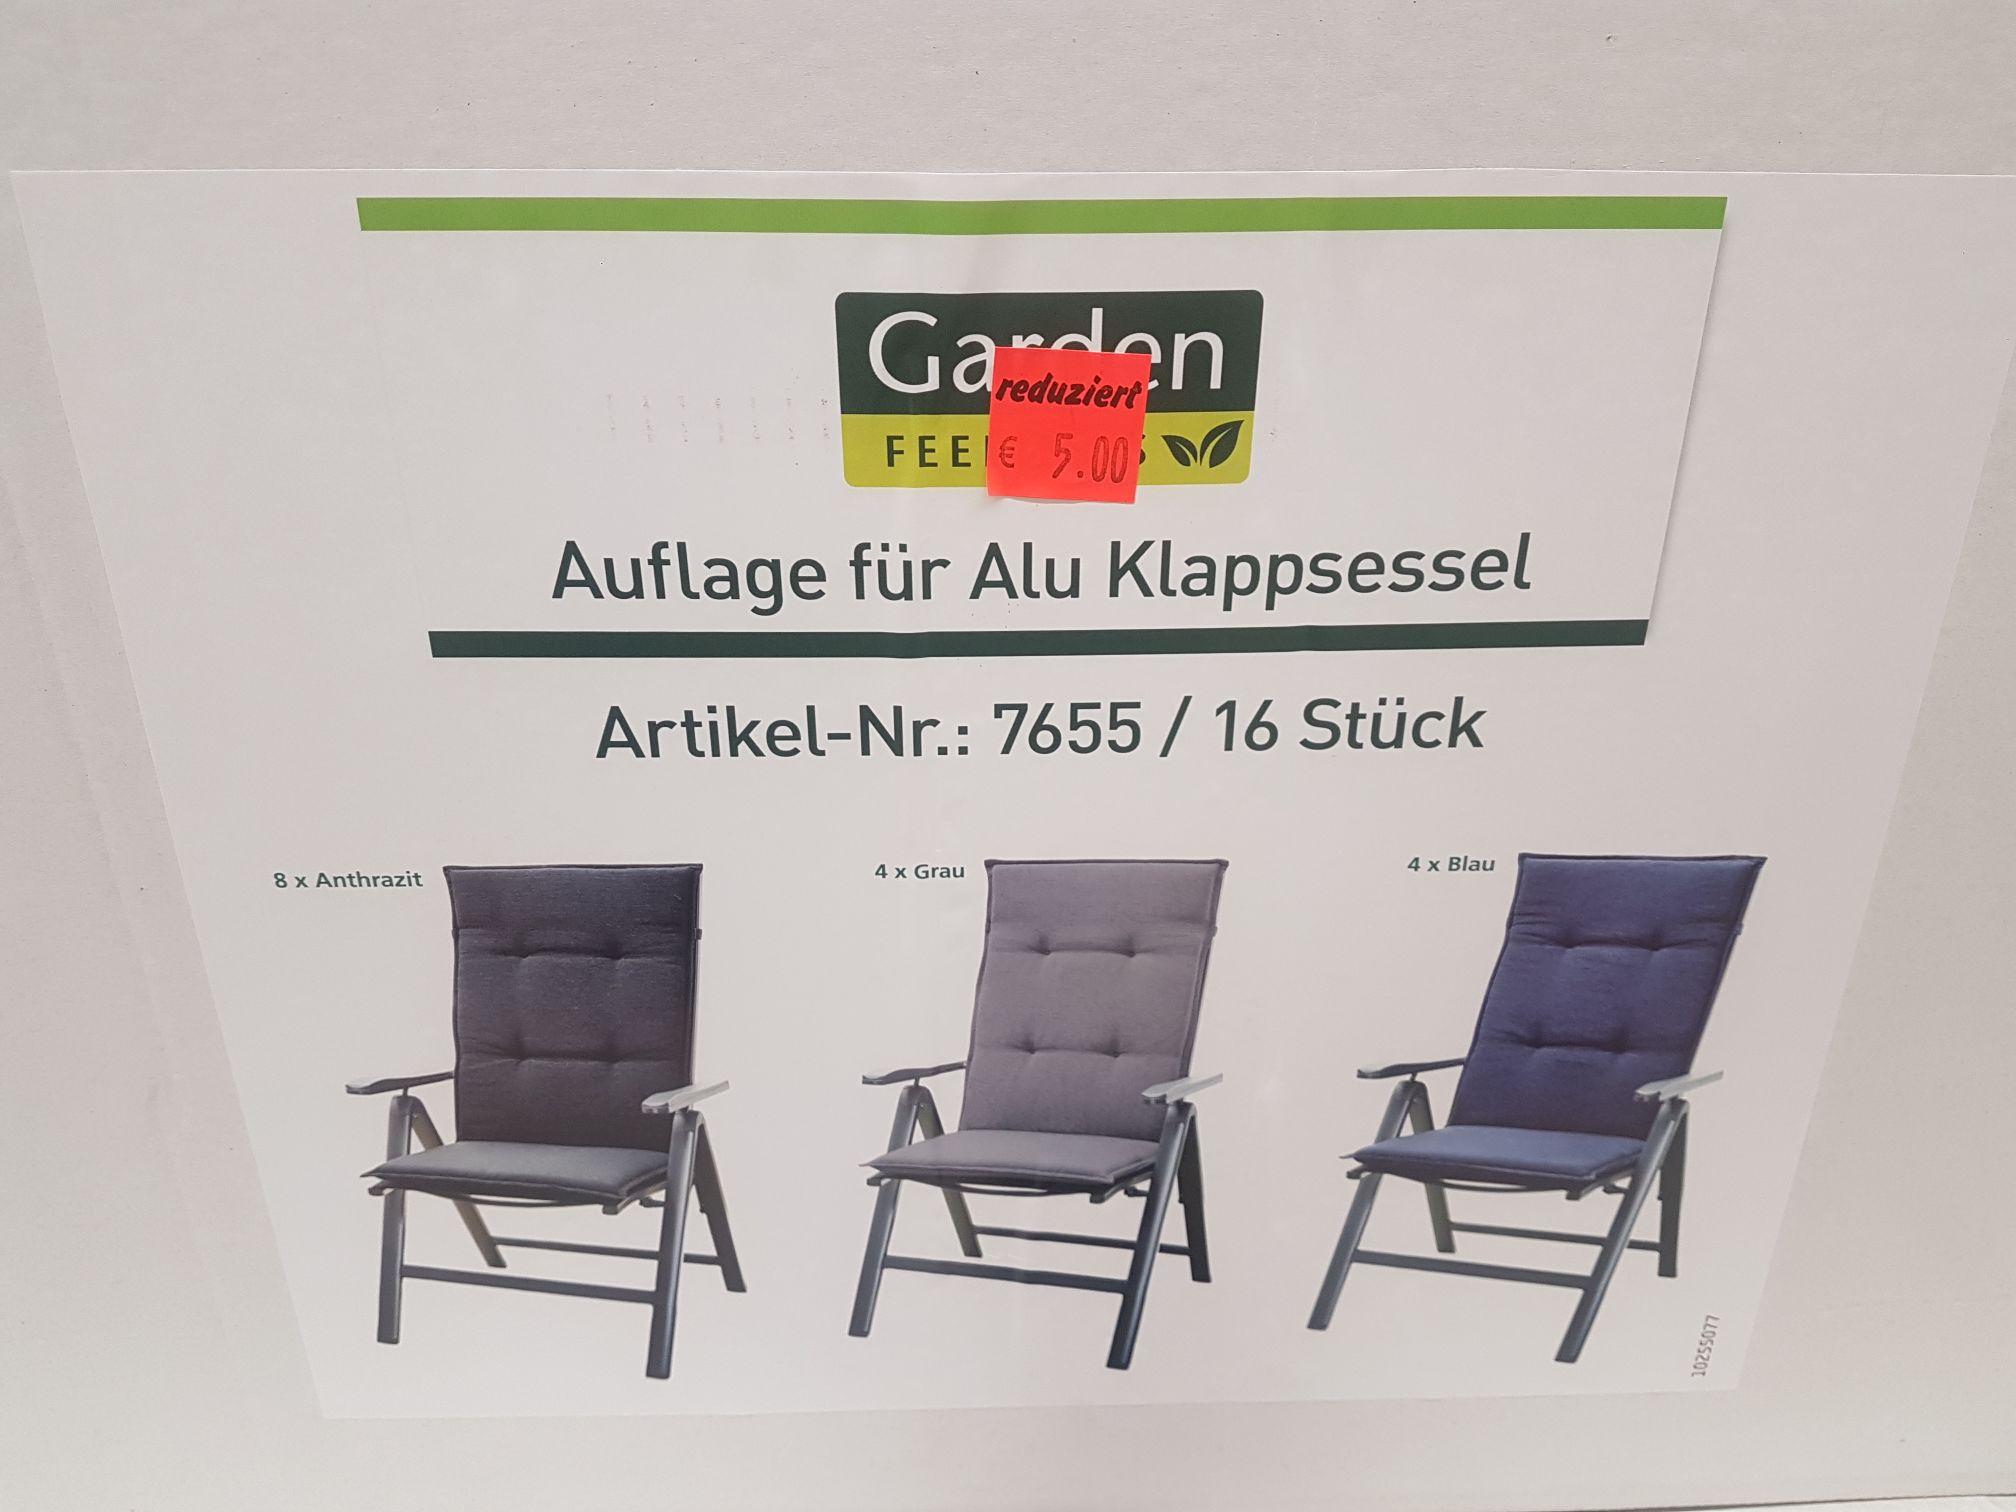 [Lokal: Aldi Berlin Moabit] Gartenstuhl Sitzkissen